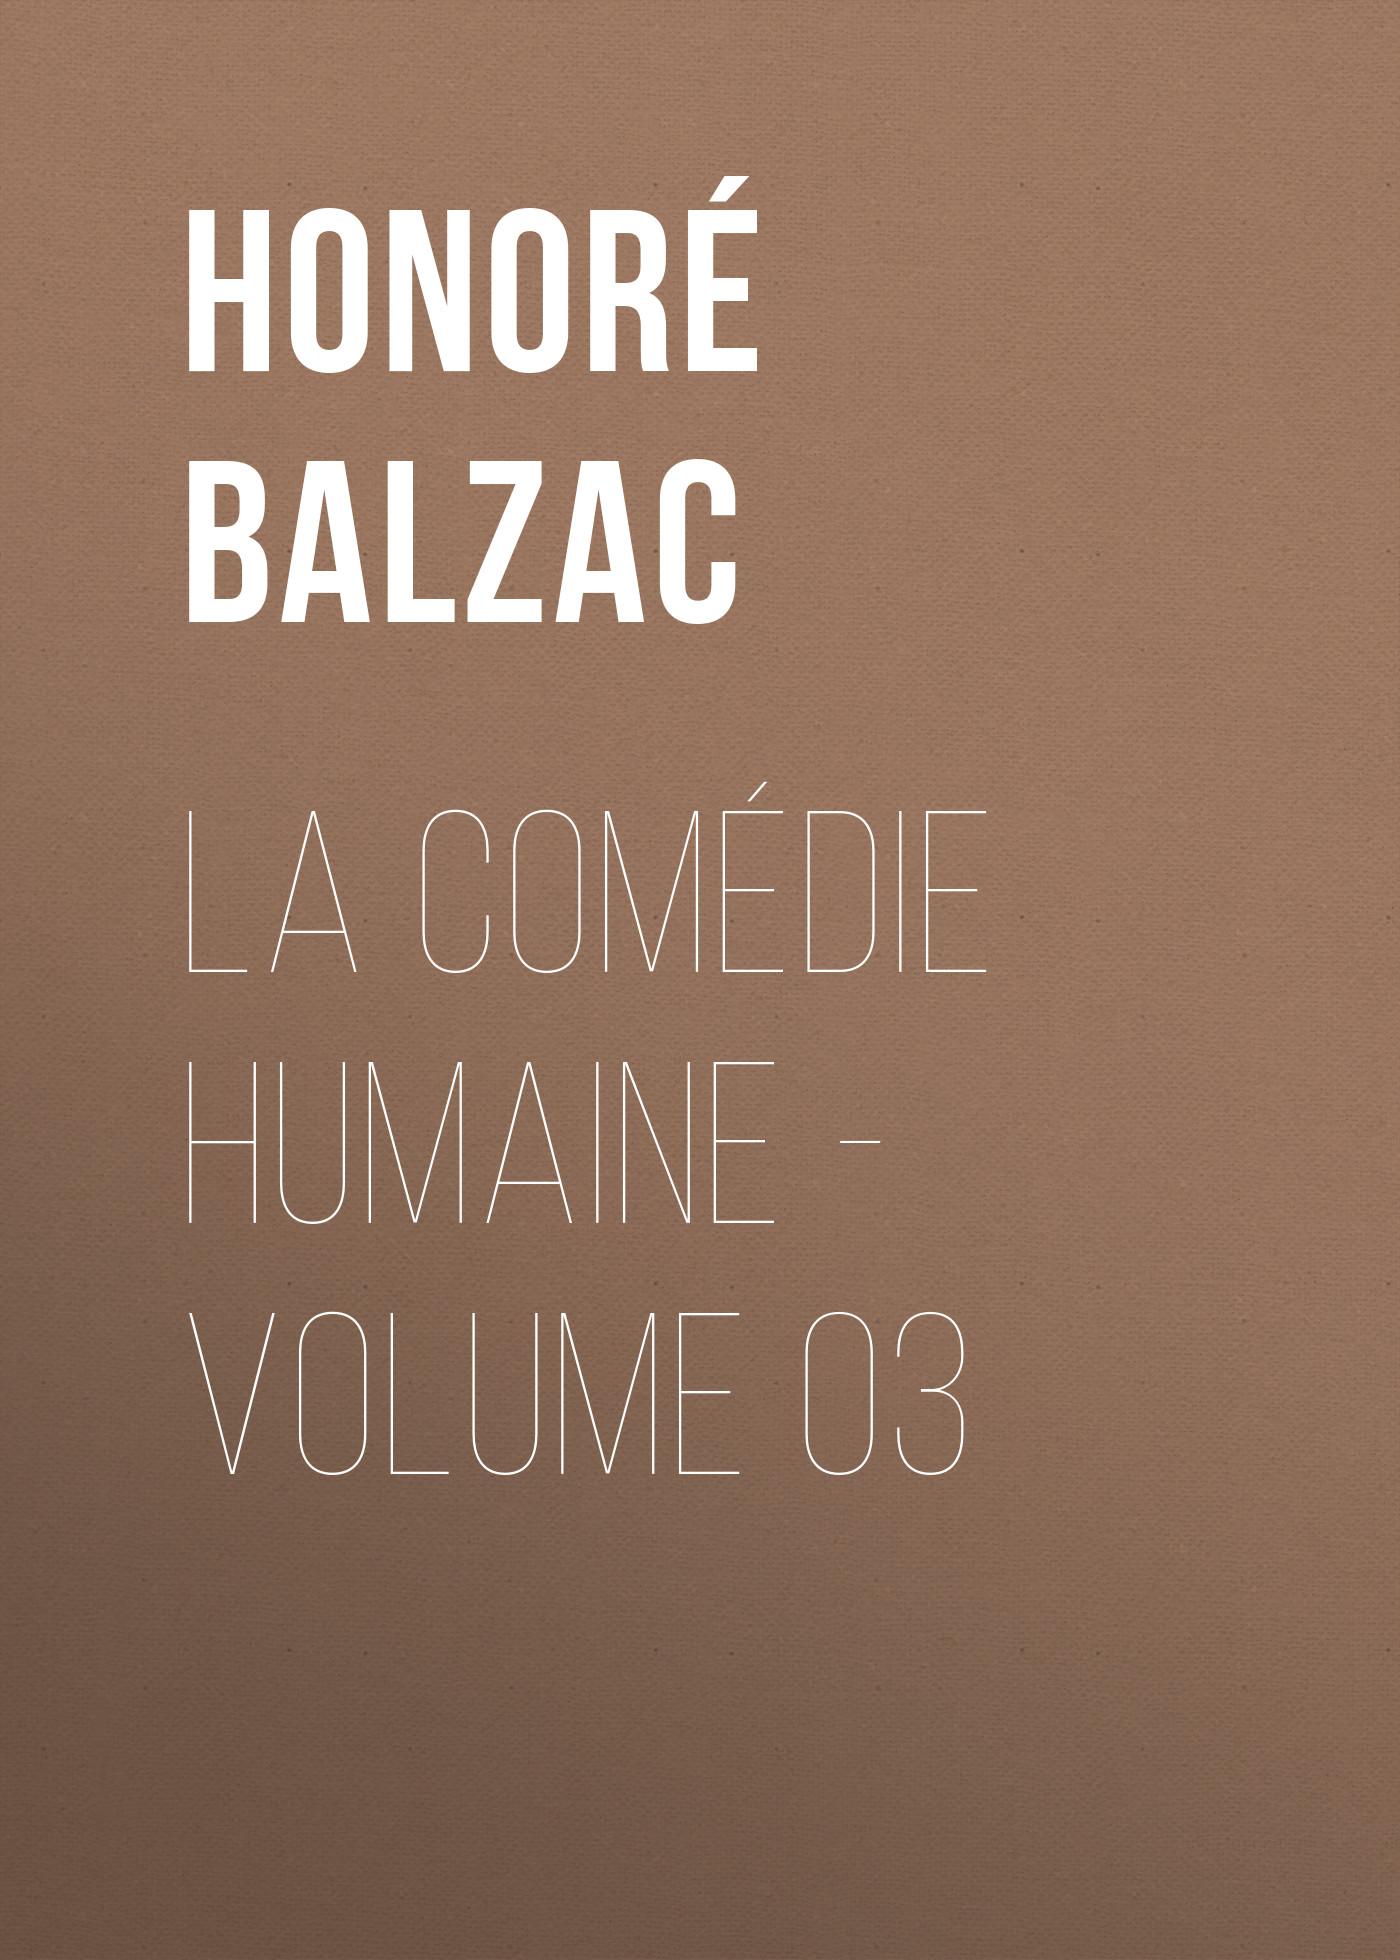 la comedie humaine volume 03